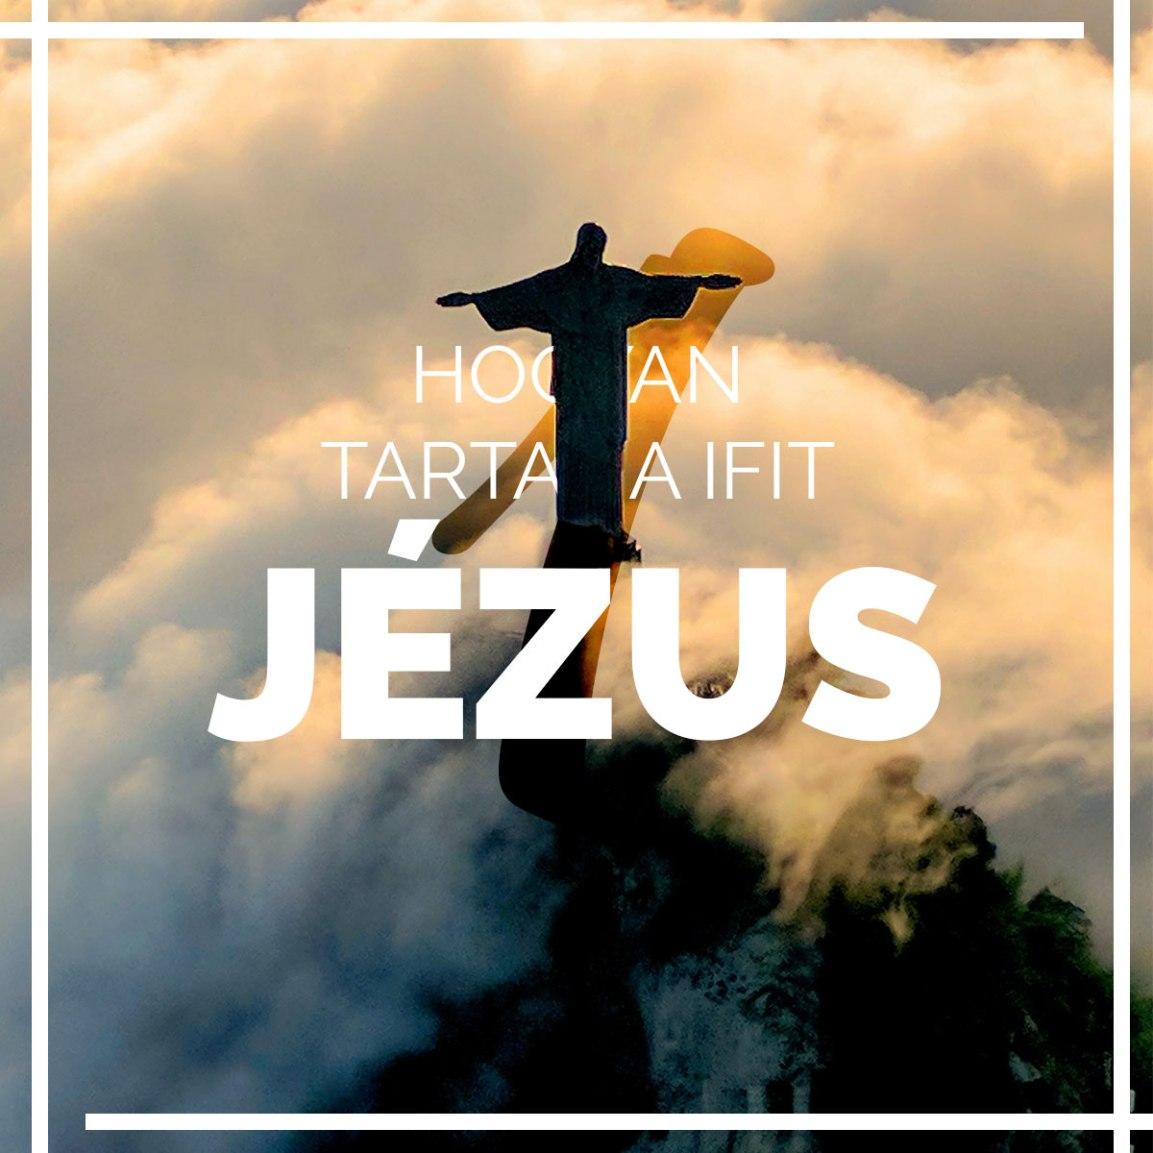 Hogyan tartana ifit Jézus?1.